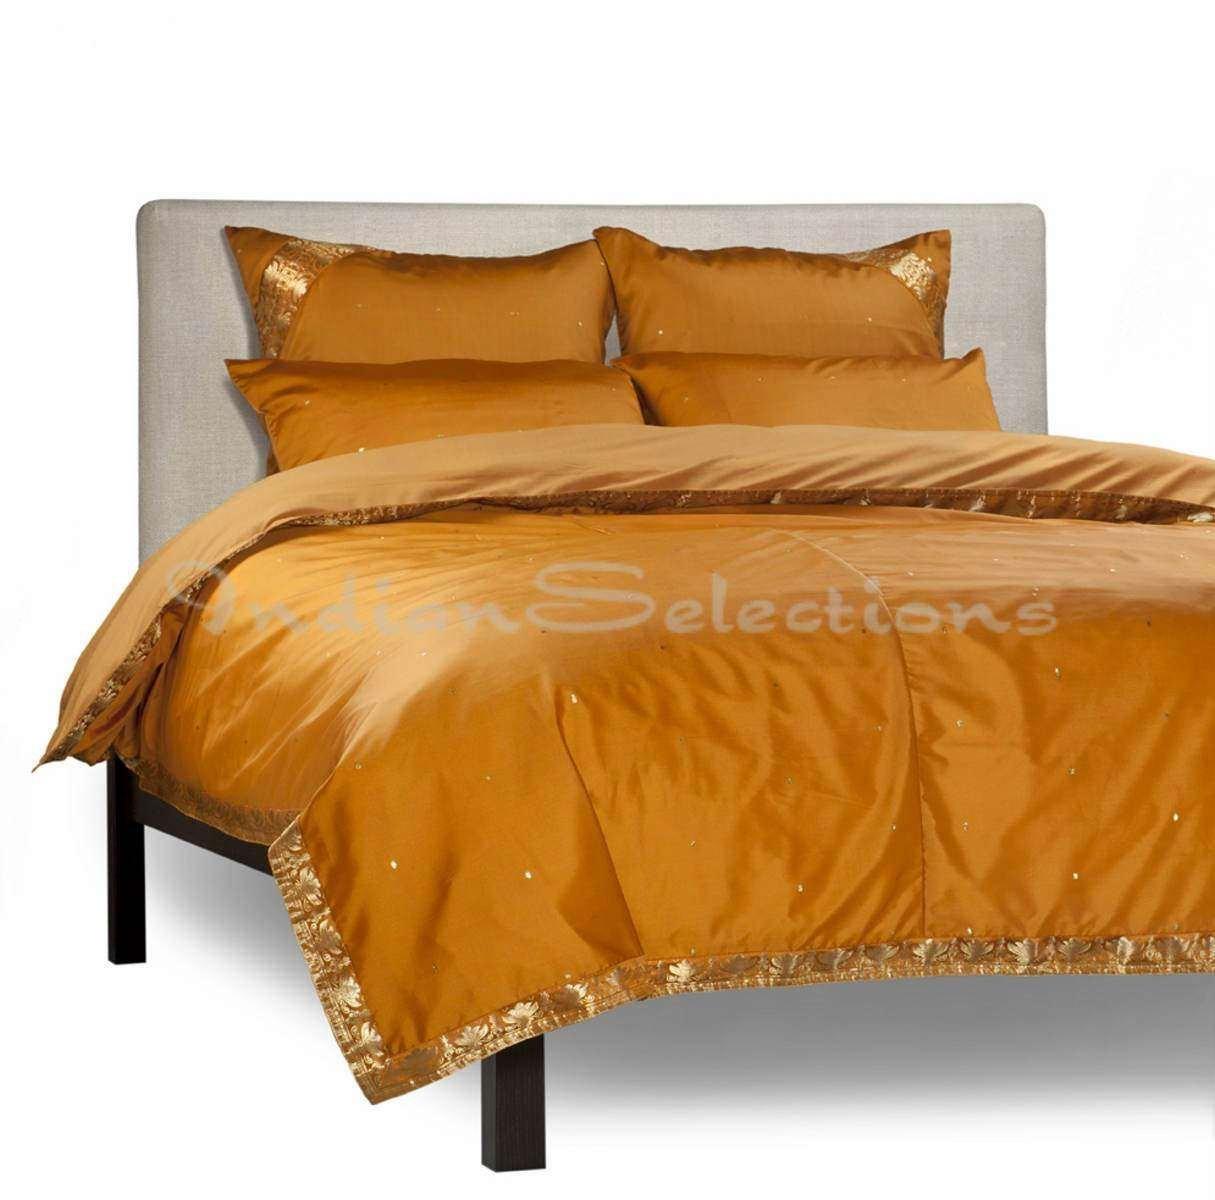 Mustard - 5 Piece Handmade Sari Duvet Cover Set with Pillow Covers / Euro Sham - Twin